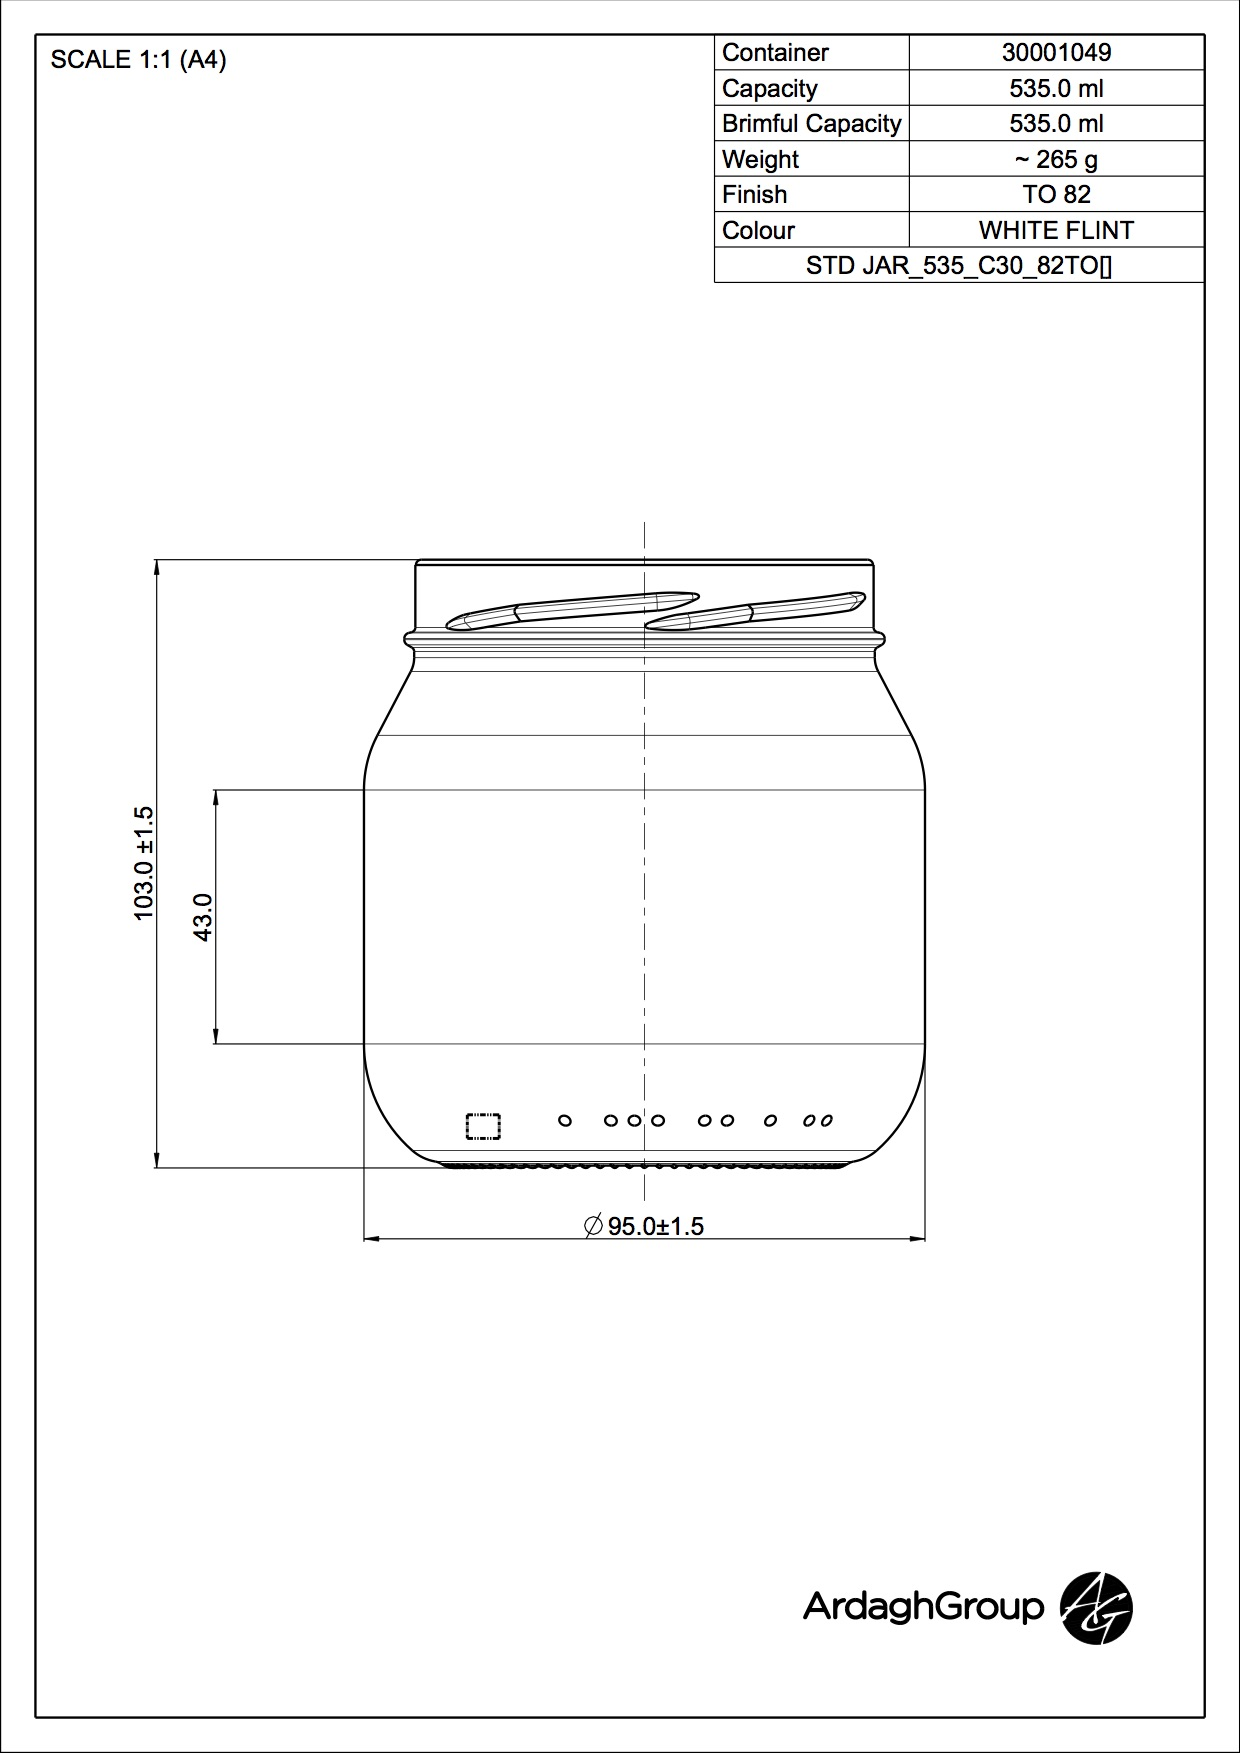 STD JAR 535 C30 82TO